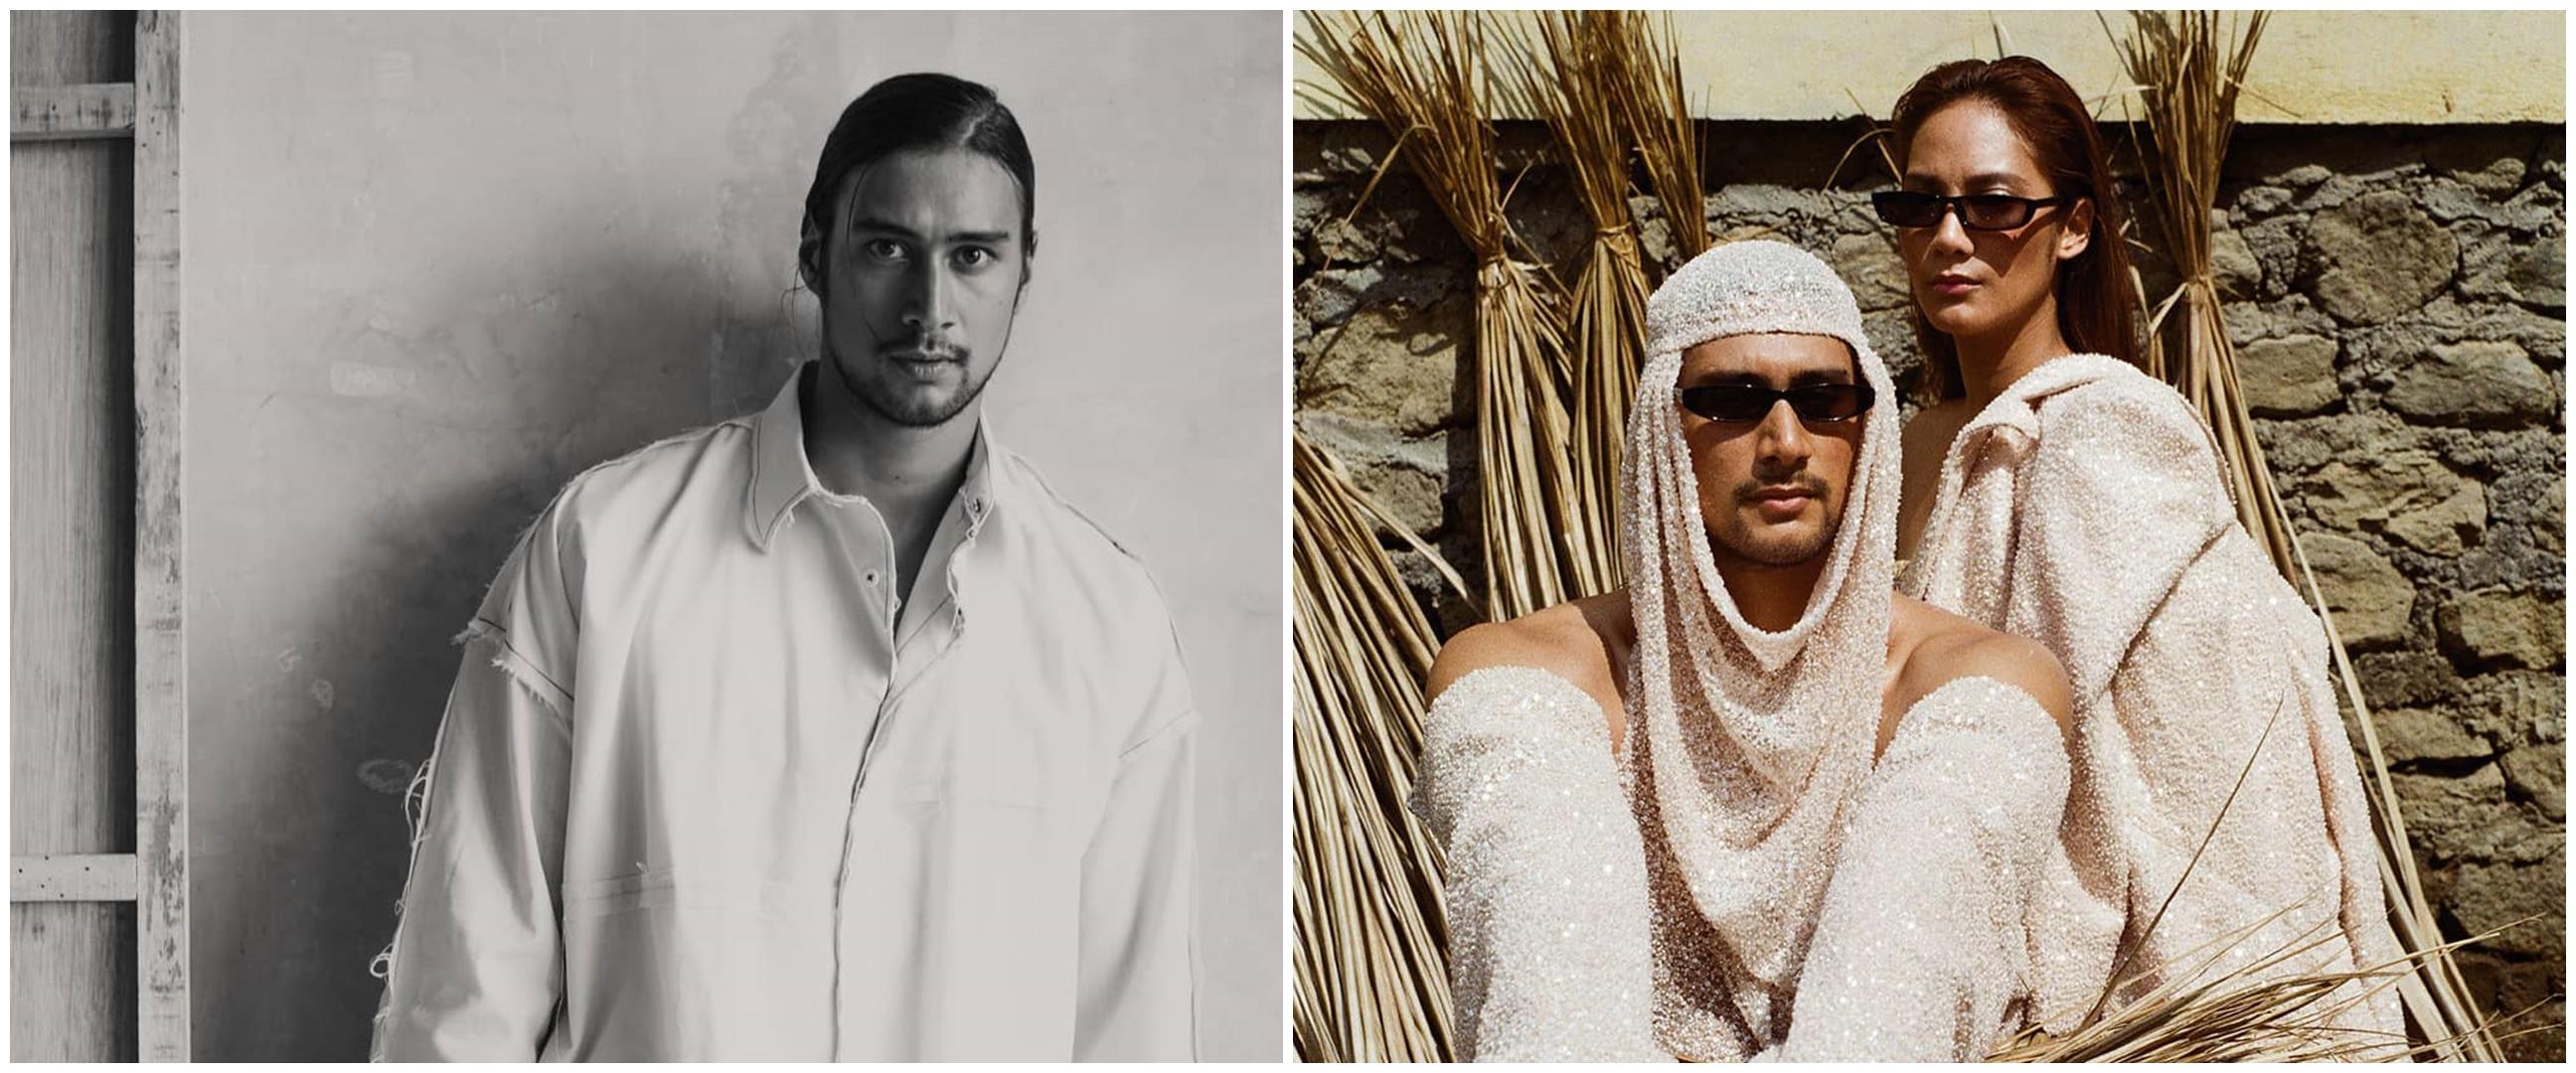 7 Potret ganteng Daniel Adnan, suami Tara Basro berdarah Eropa-Jawa